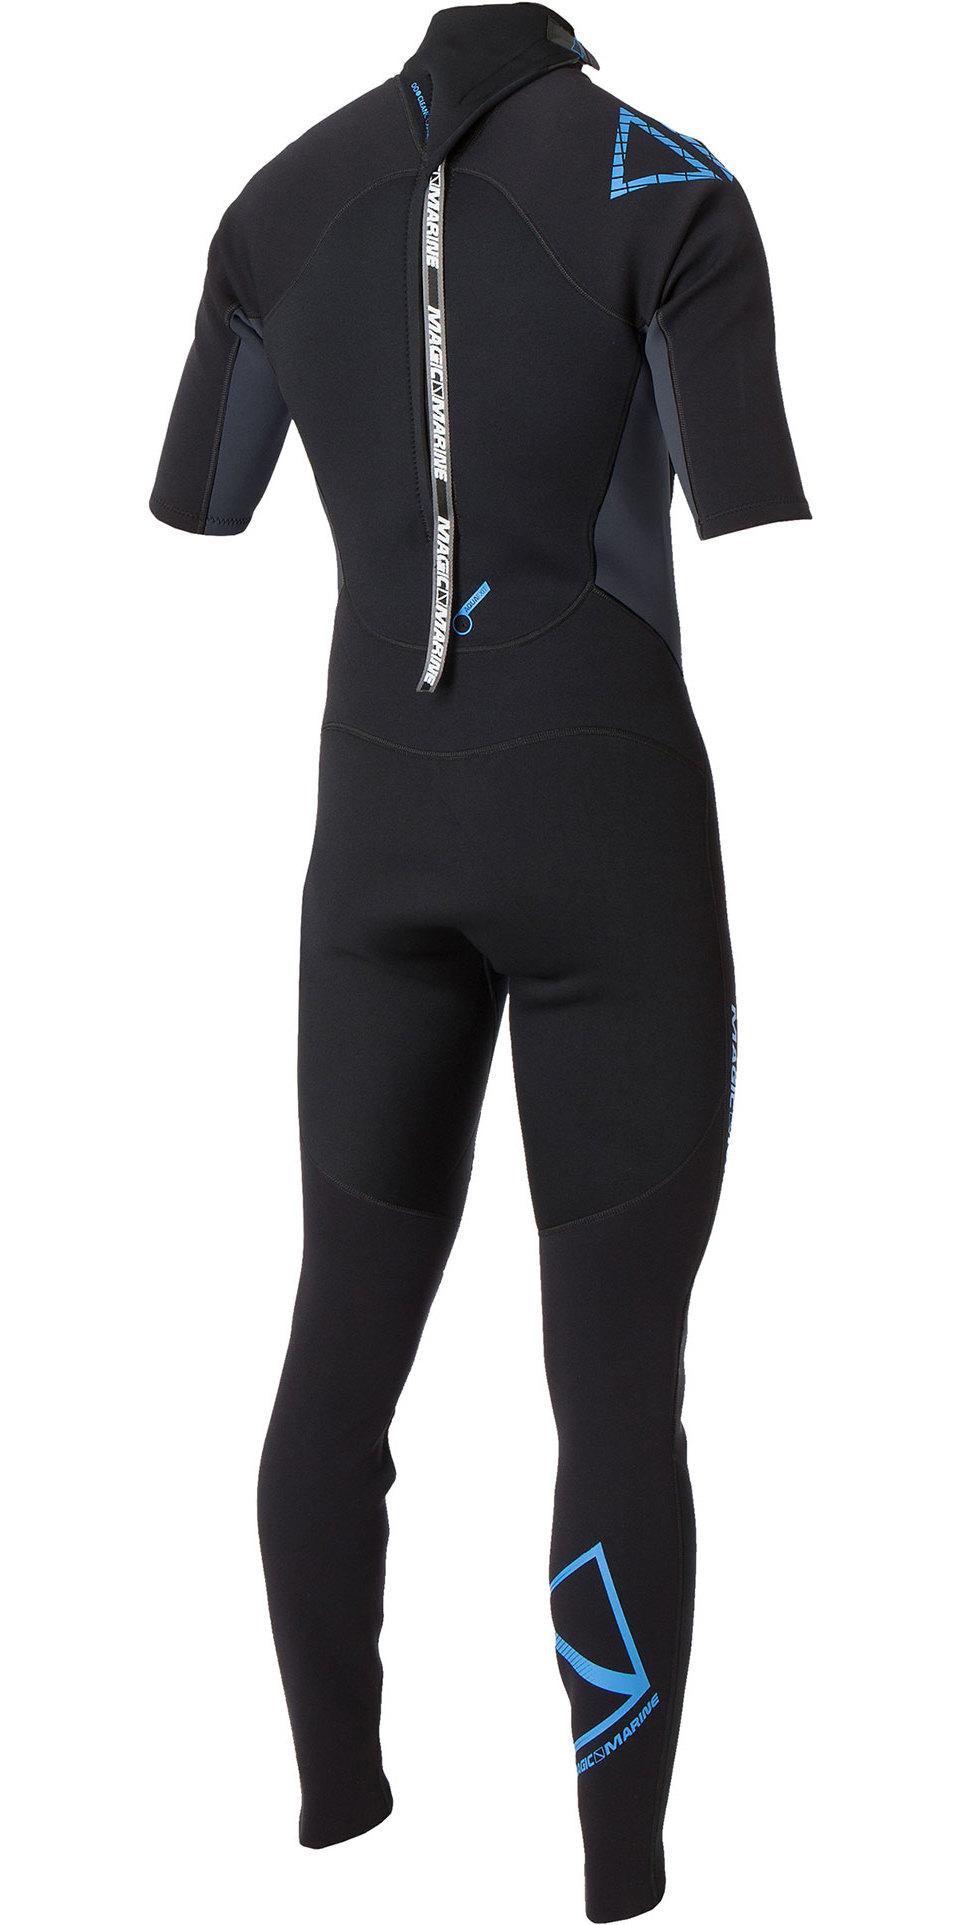 2020 Magic Marine Junior Brand 3/2mm Short Arm Back Zip Wetsuit Black / Blue 160020